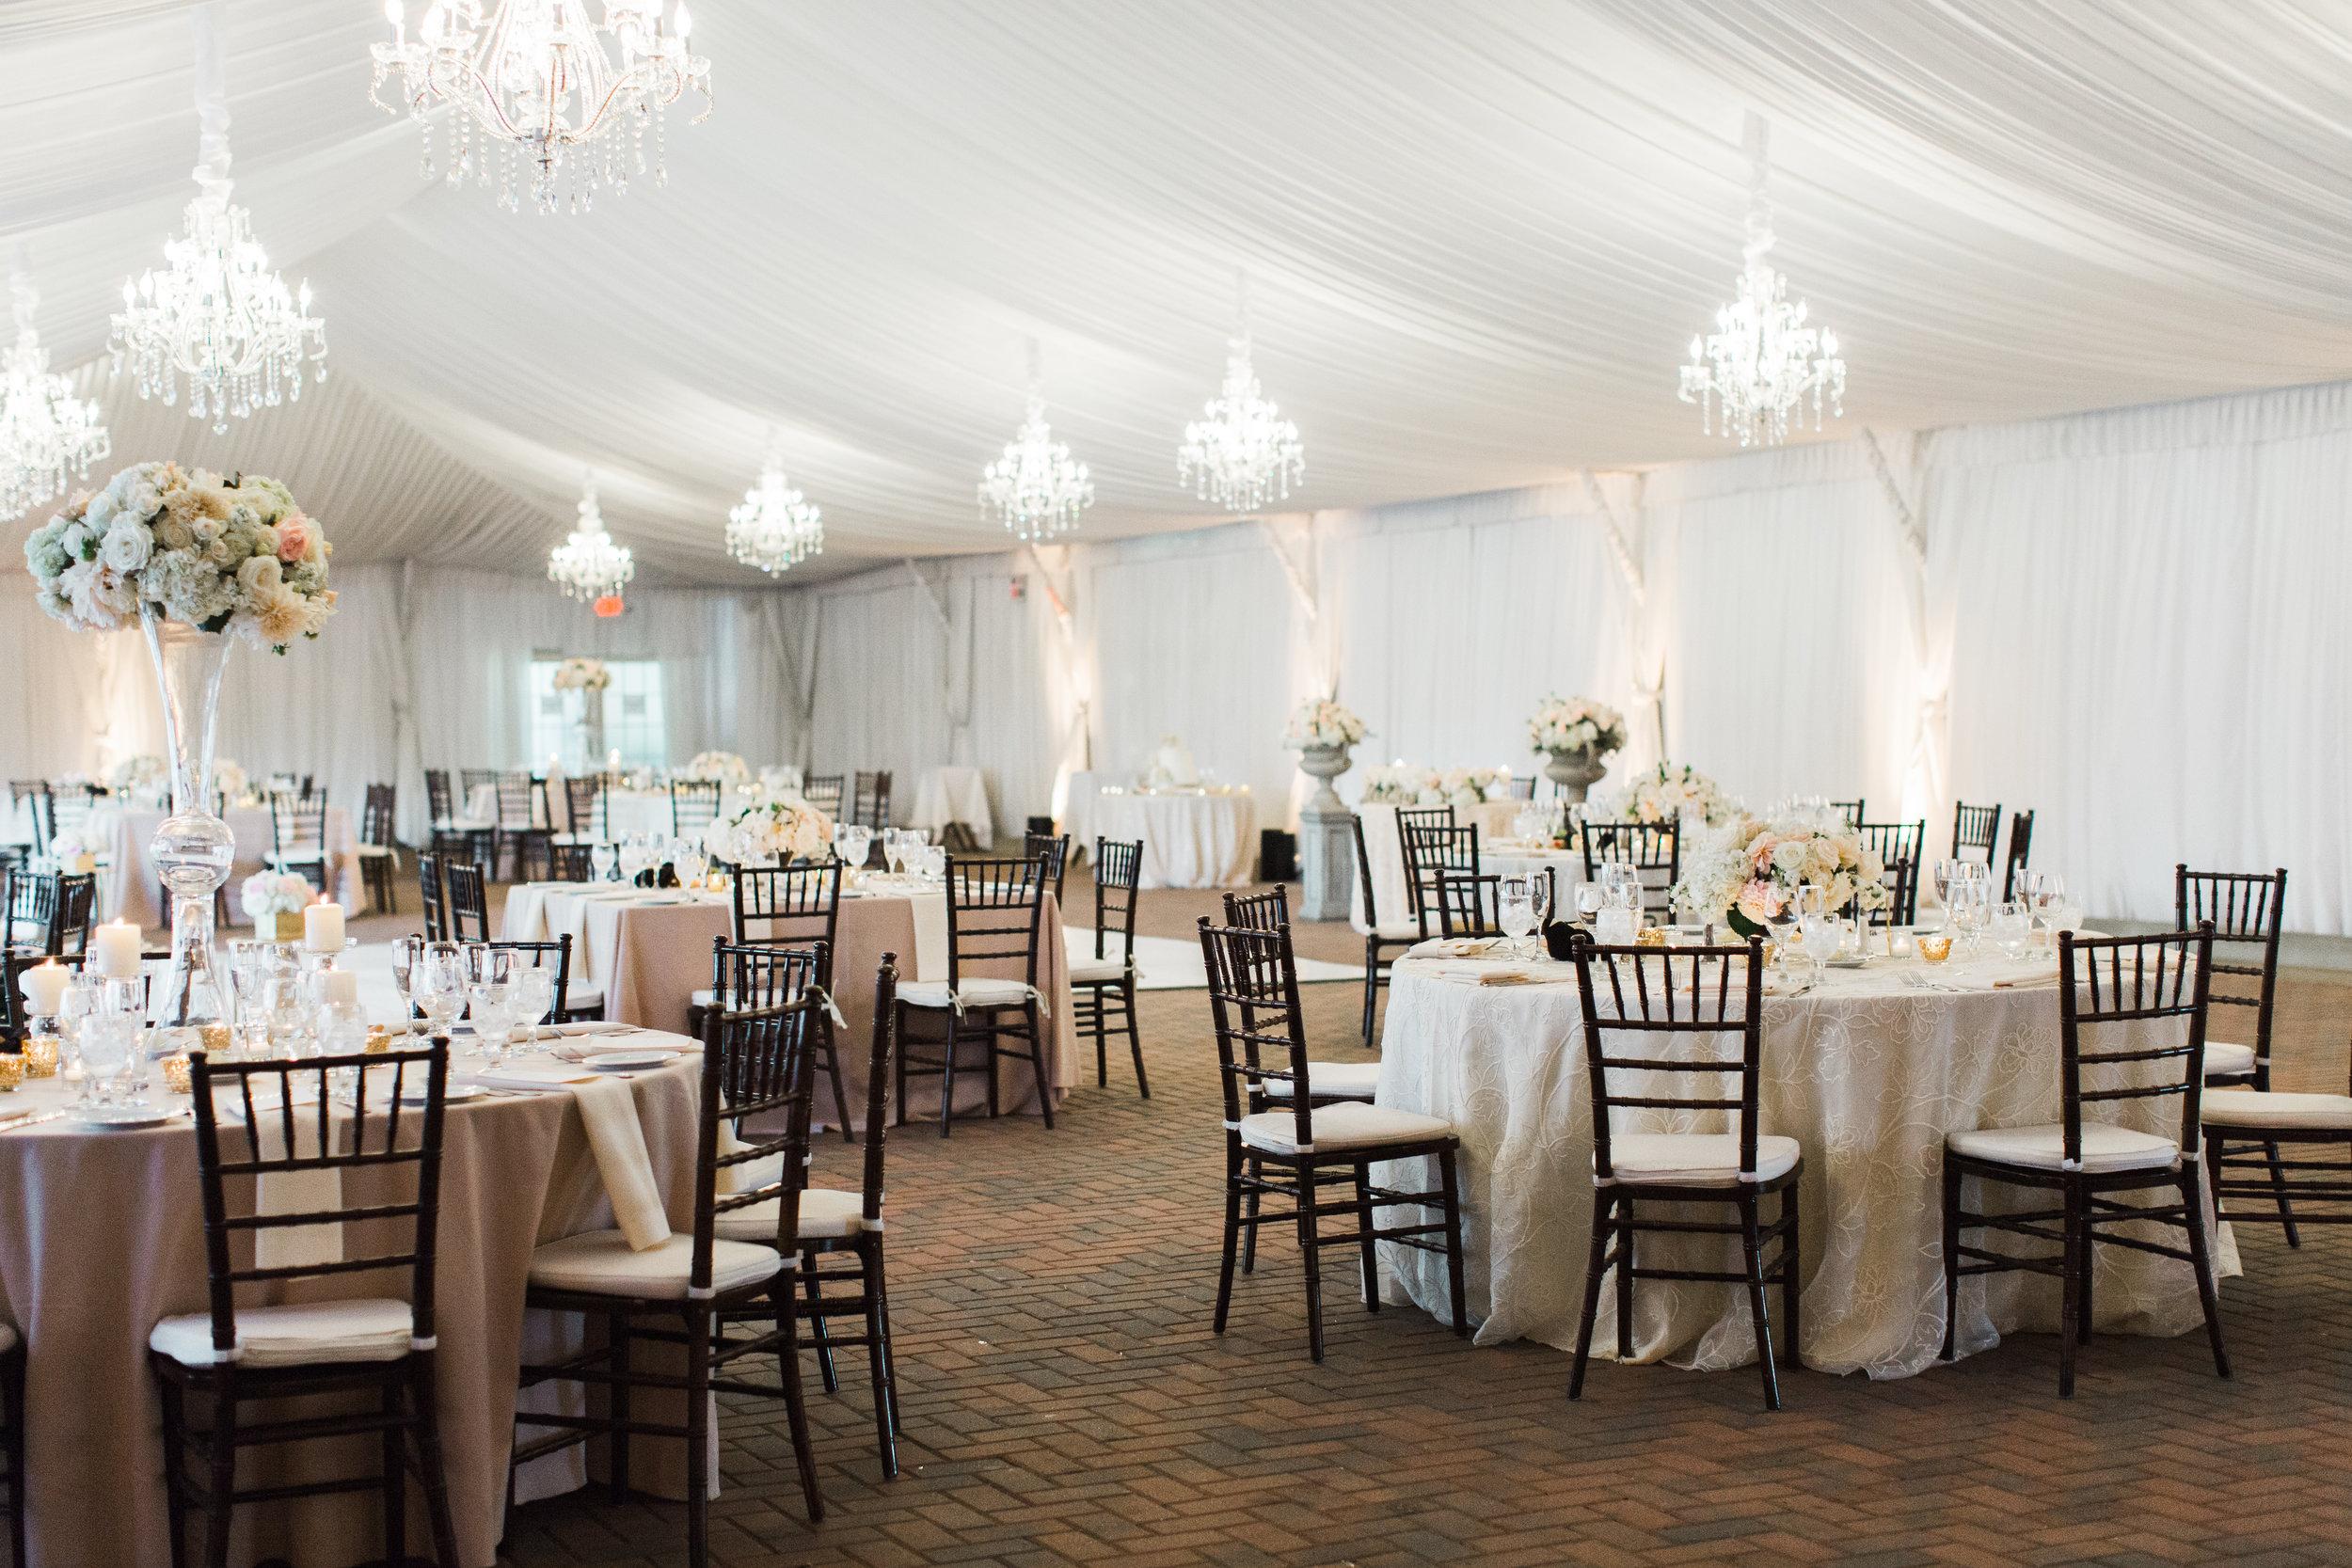 jenny-and-george-wedding-roque-events-meyerott-photography 1180.jpg